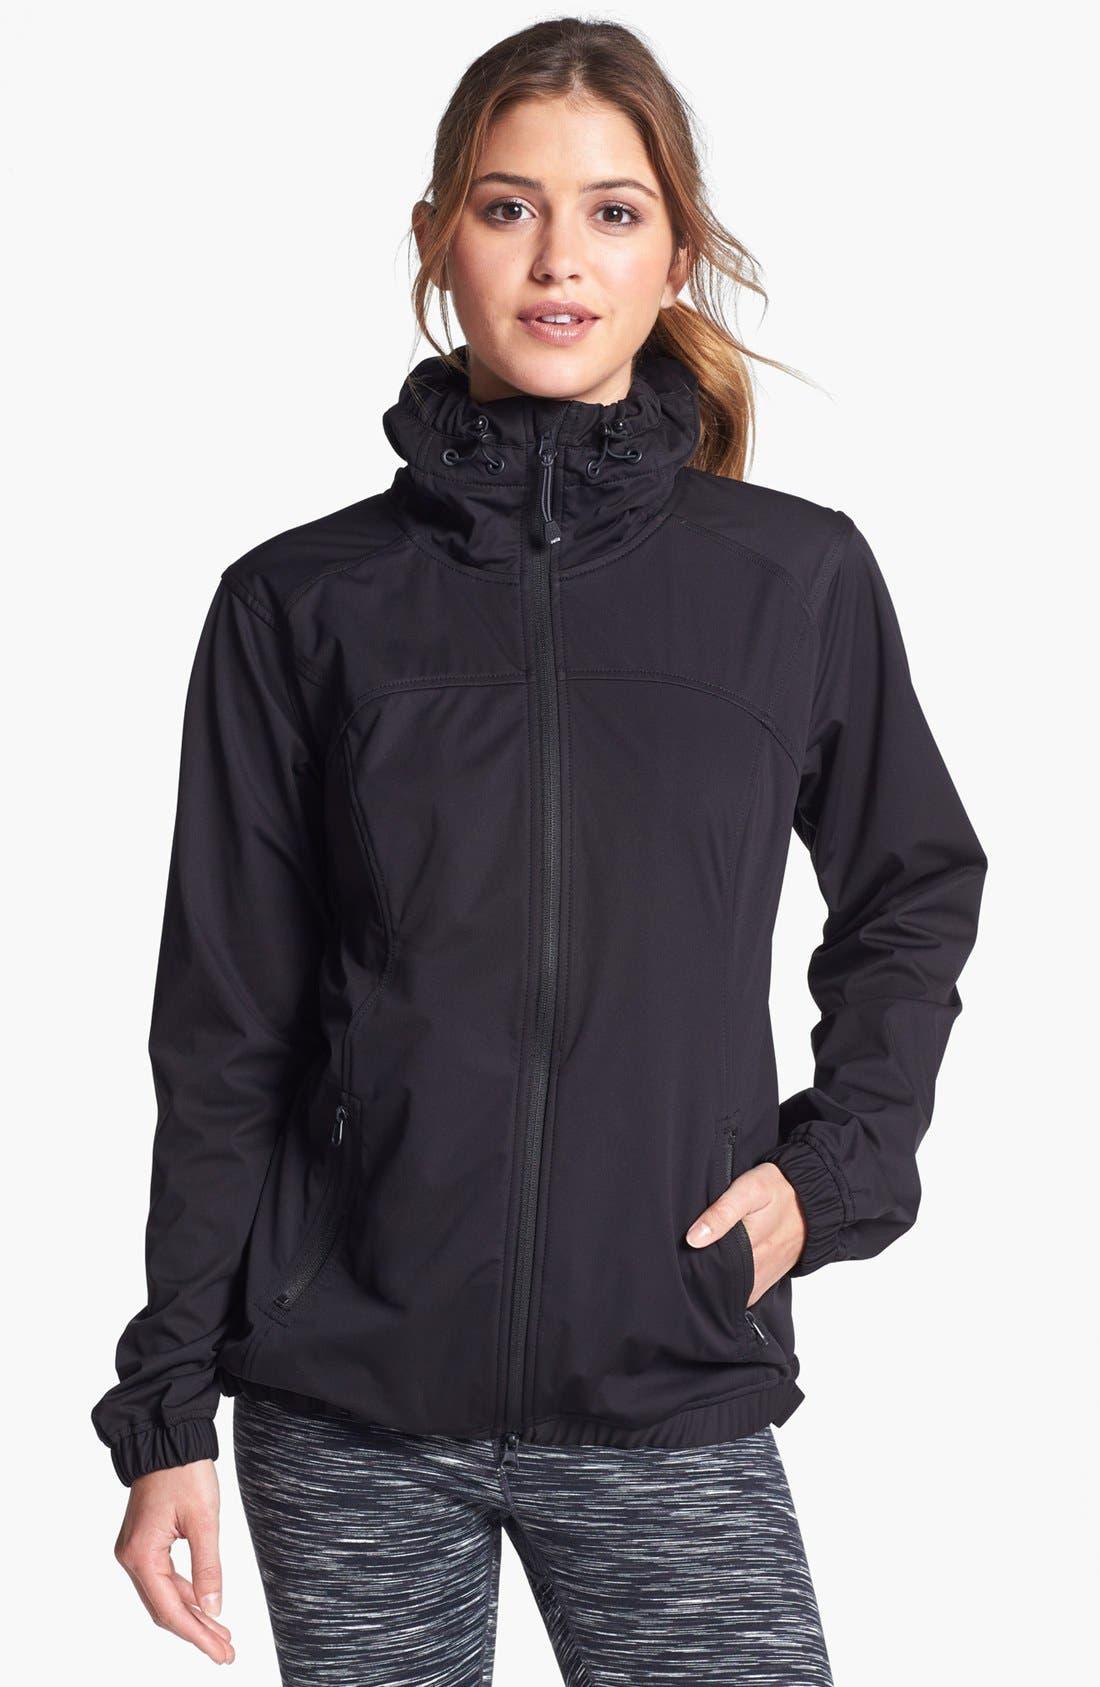 Alternate Image 1 Selected - Zella 'Luxe' Rain Jacket